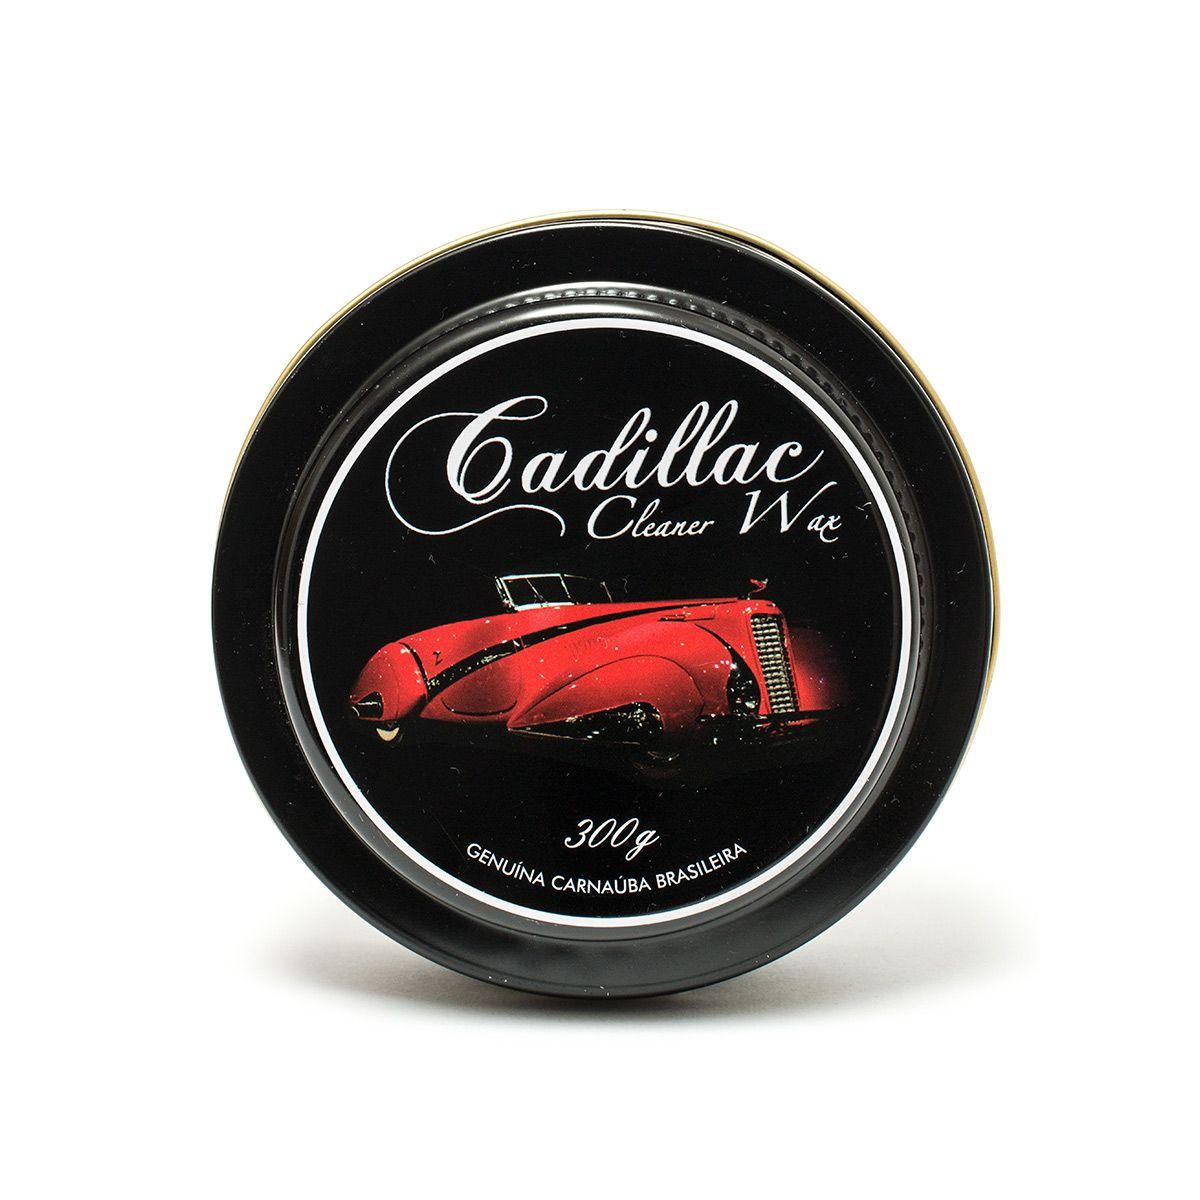 Cera de Carnaúba Cleaner Wax - Cadillac 300gr